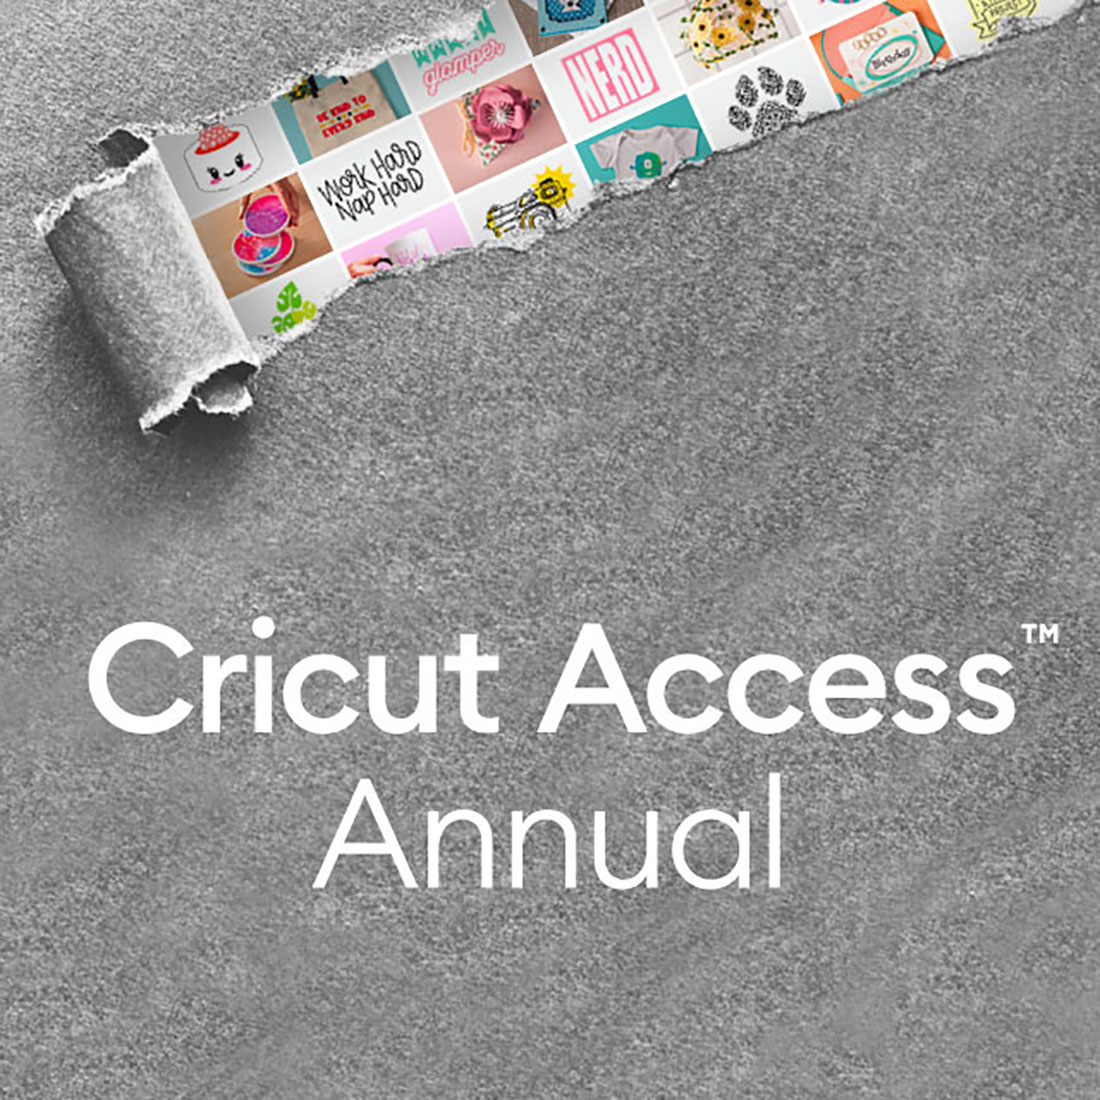 Cricut Access Annual Subscription